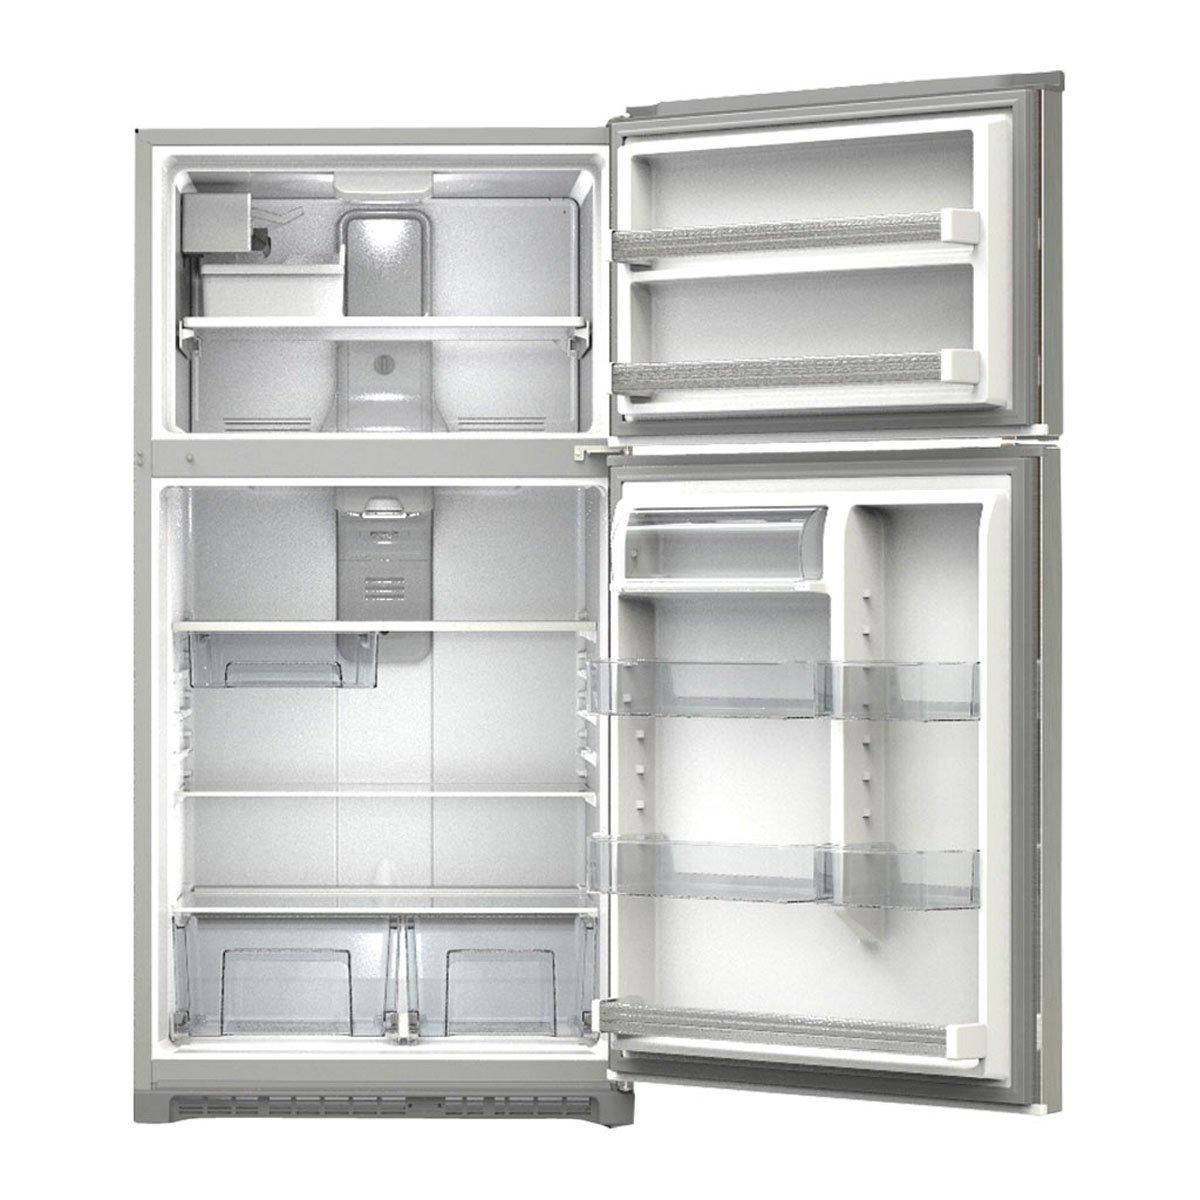 Refrigerador whirlpool top mount 21 pies acero inoxidable for Refrigerador whirlpool